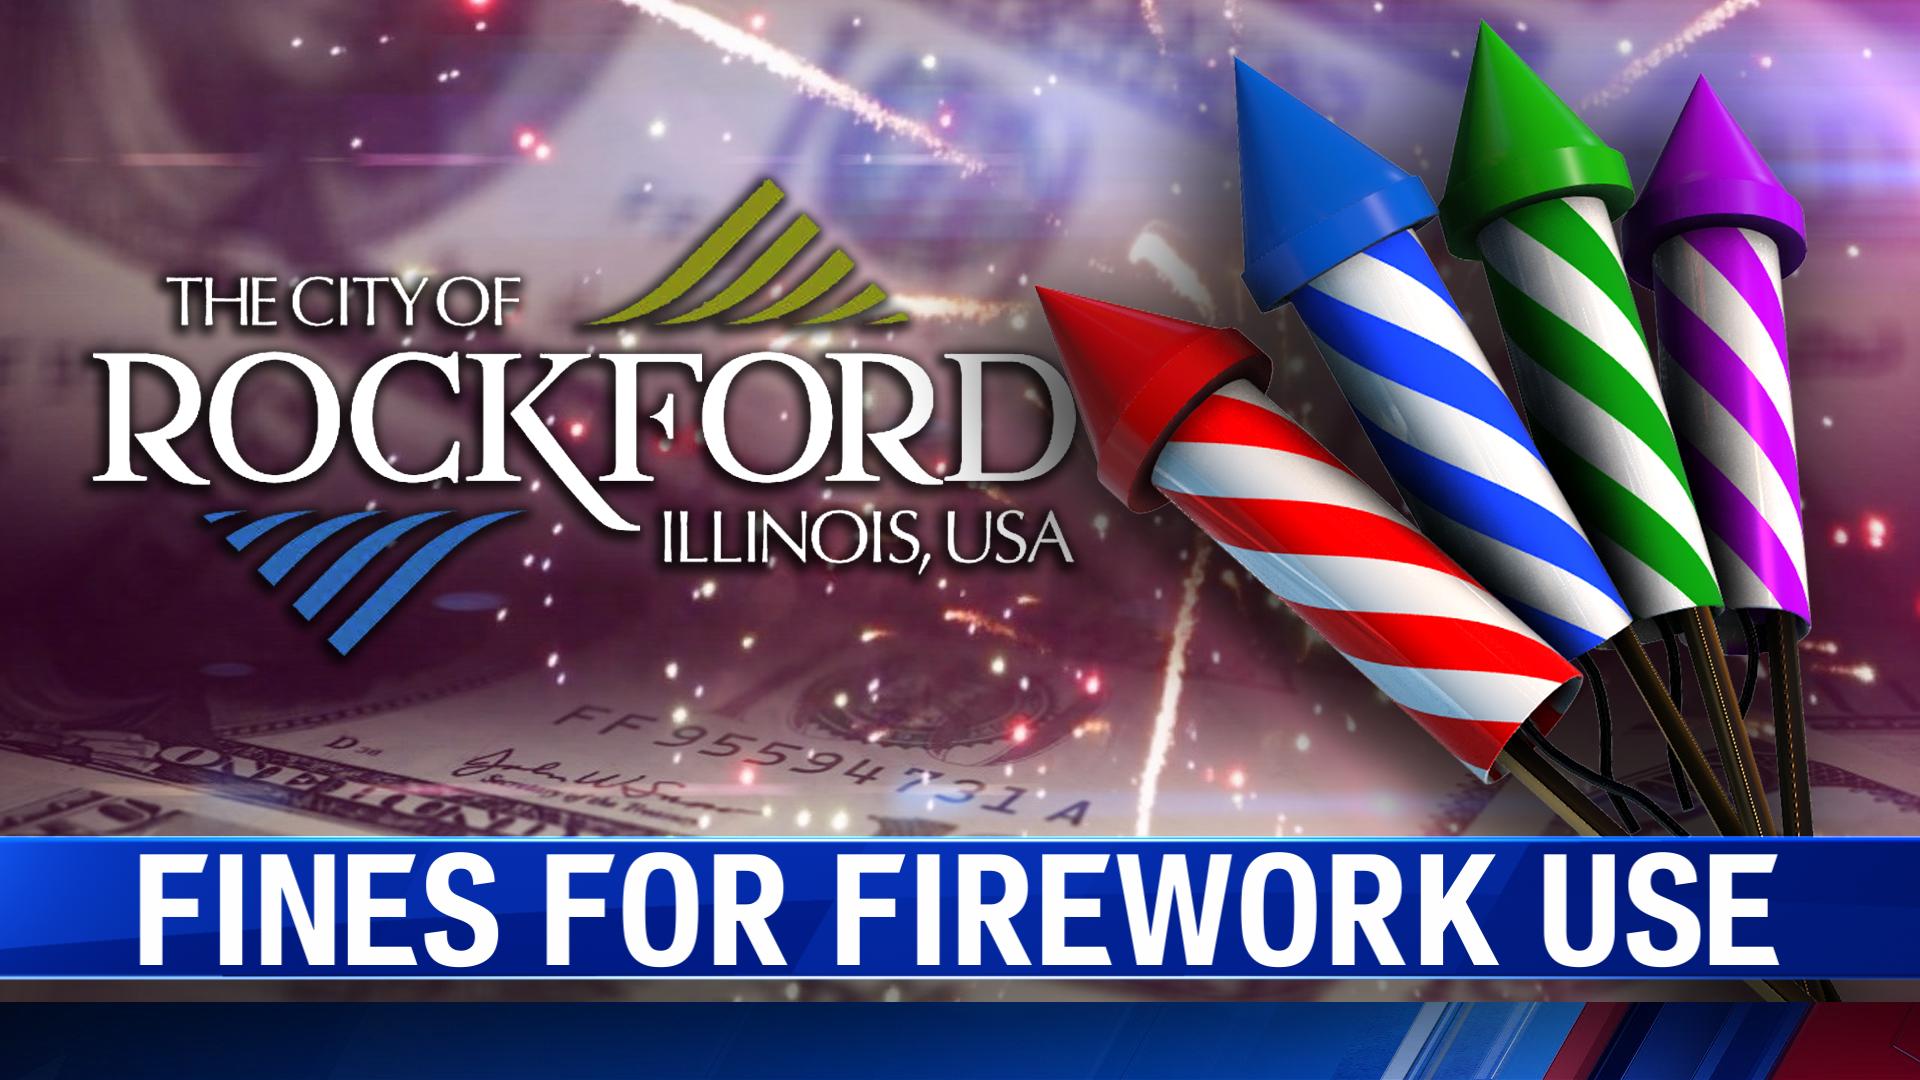 City of Rockford toughens up firework ordinances as Fourth